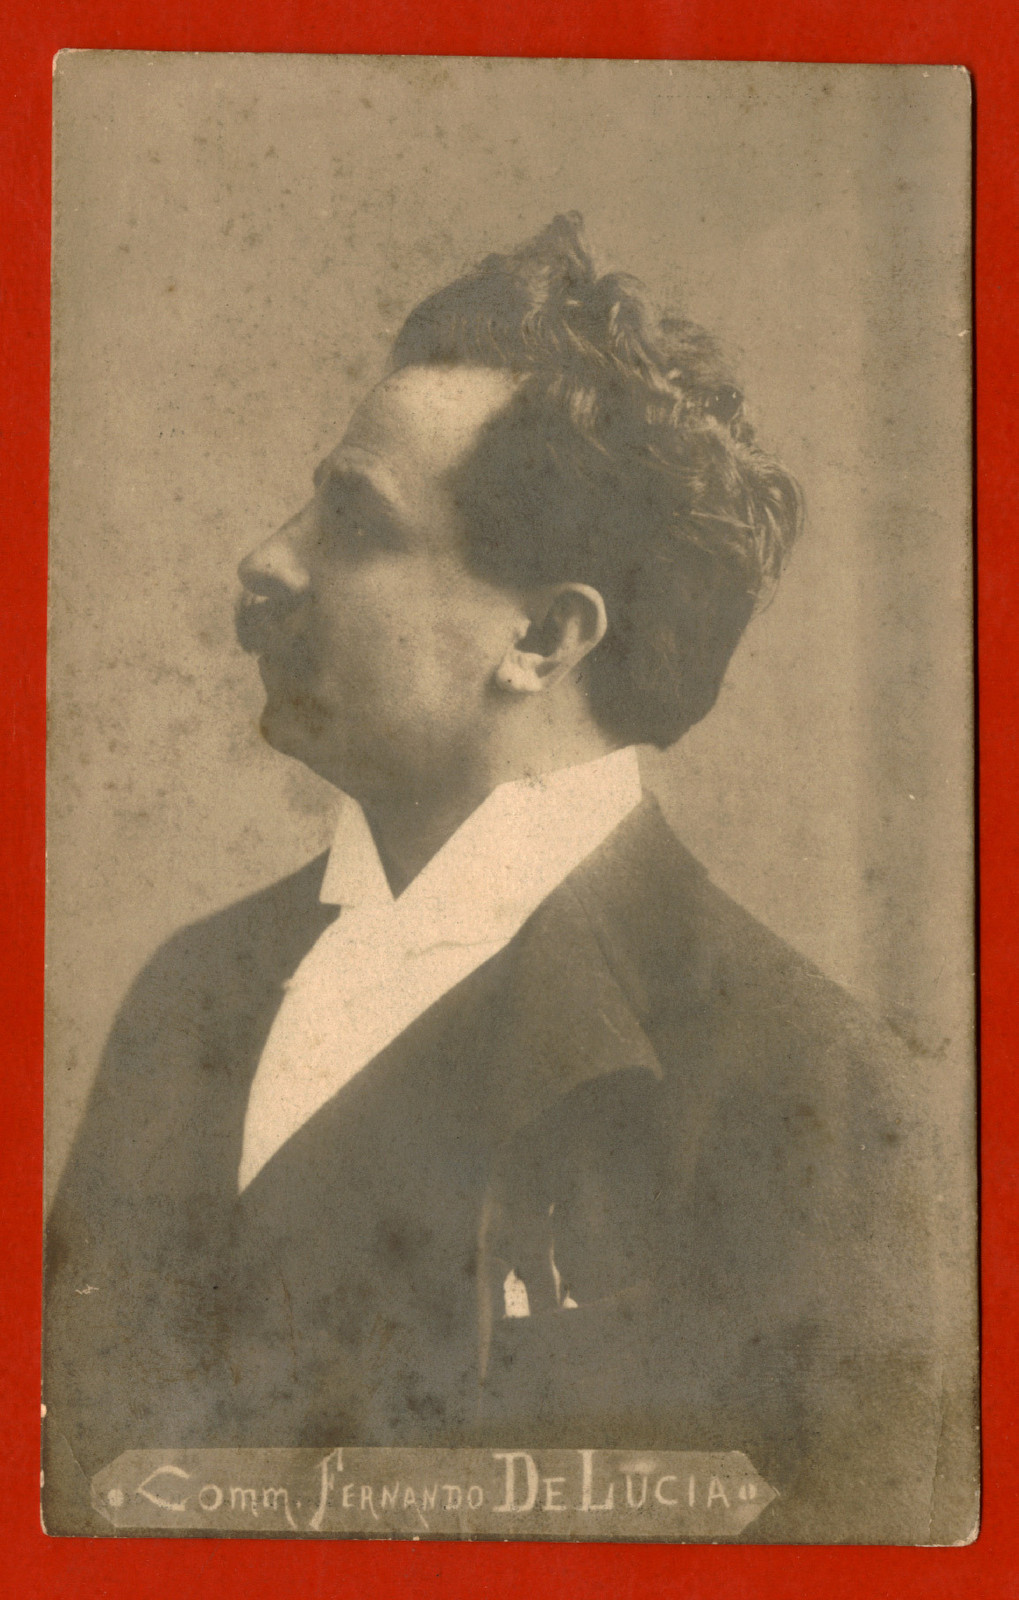 FERNANDO DE LUCIA (1860-1925) PHONOTYPE RECORDS CD